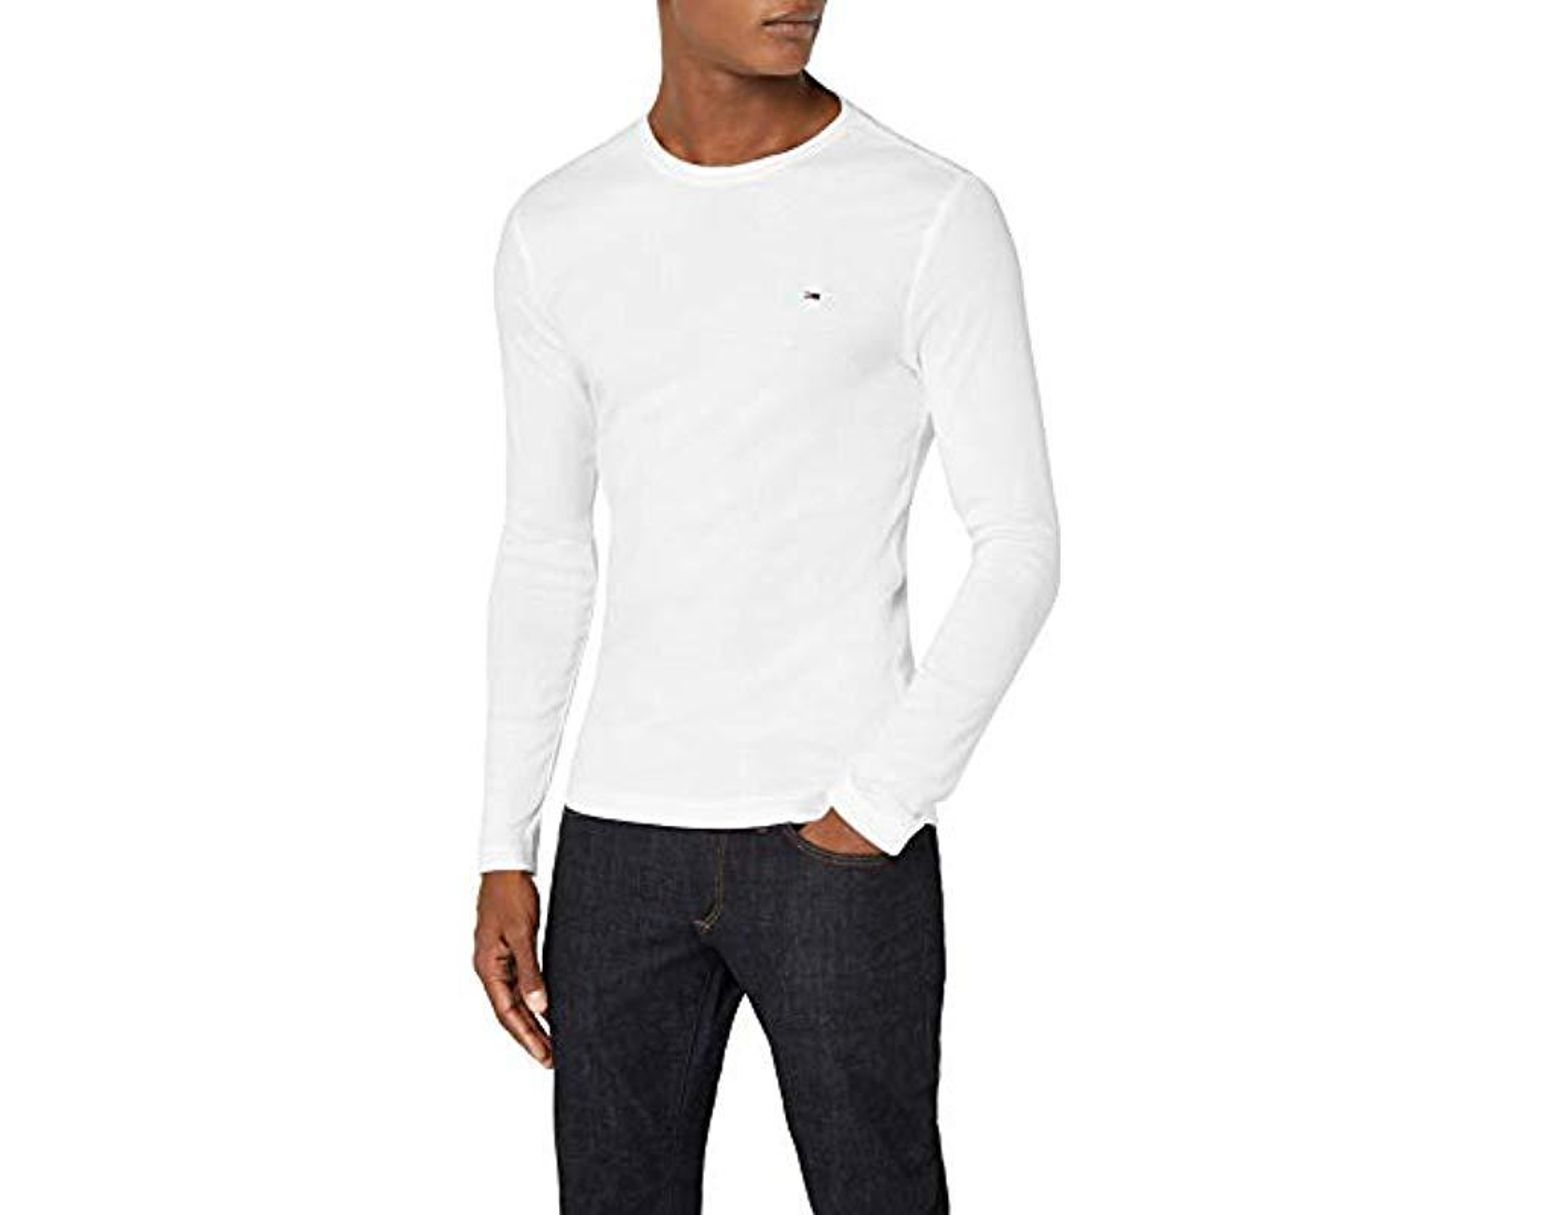 39f69228 Tommy Hilfiger Original Rib V-neck Long Sleeve Top in White for Men - Lyst